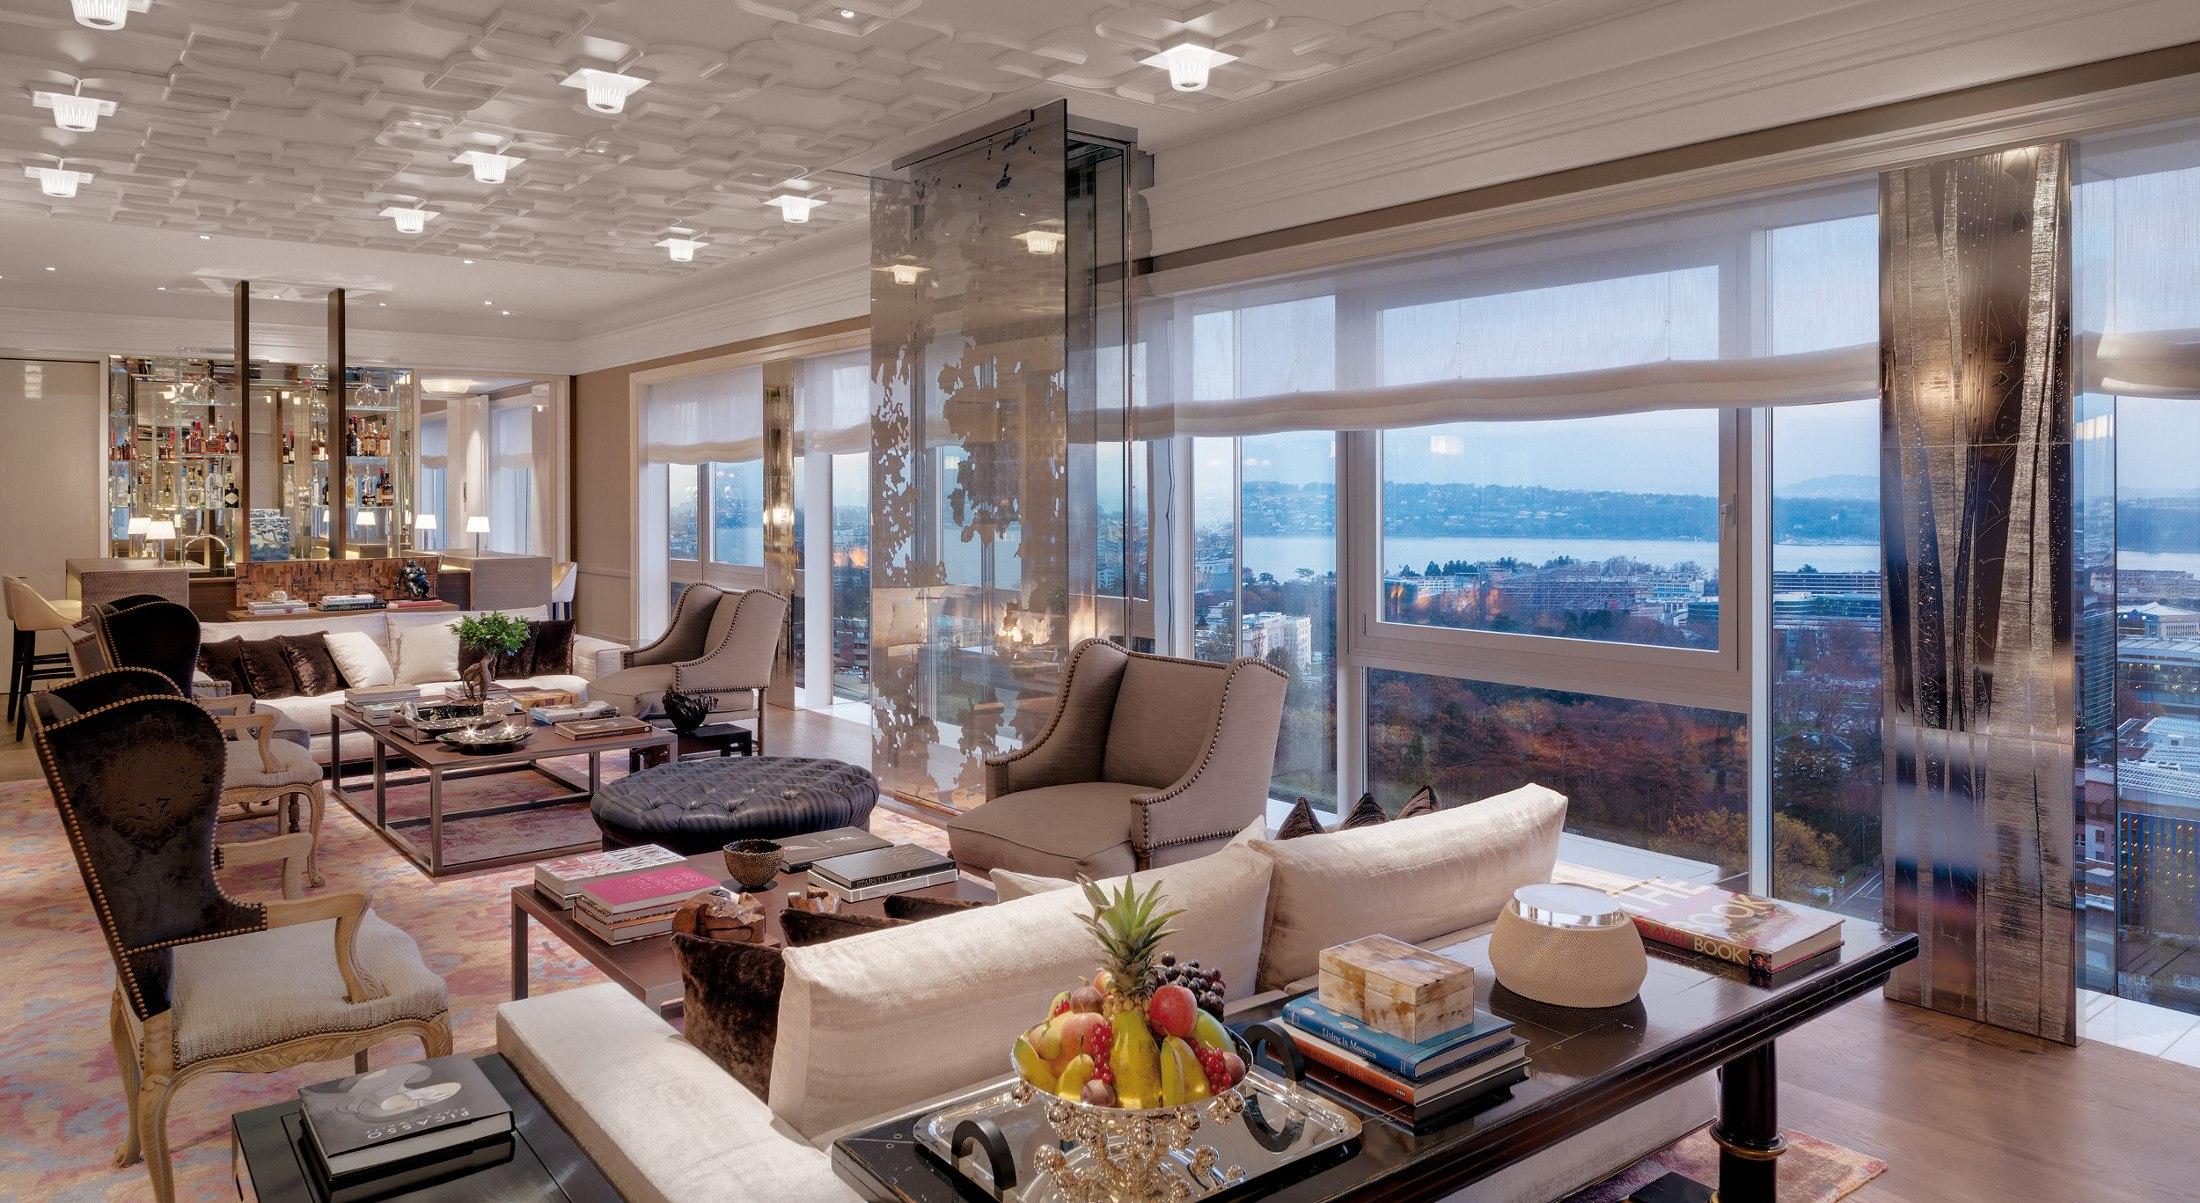 InterContinental-Geneva-Hotel-the-residence-5